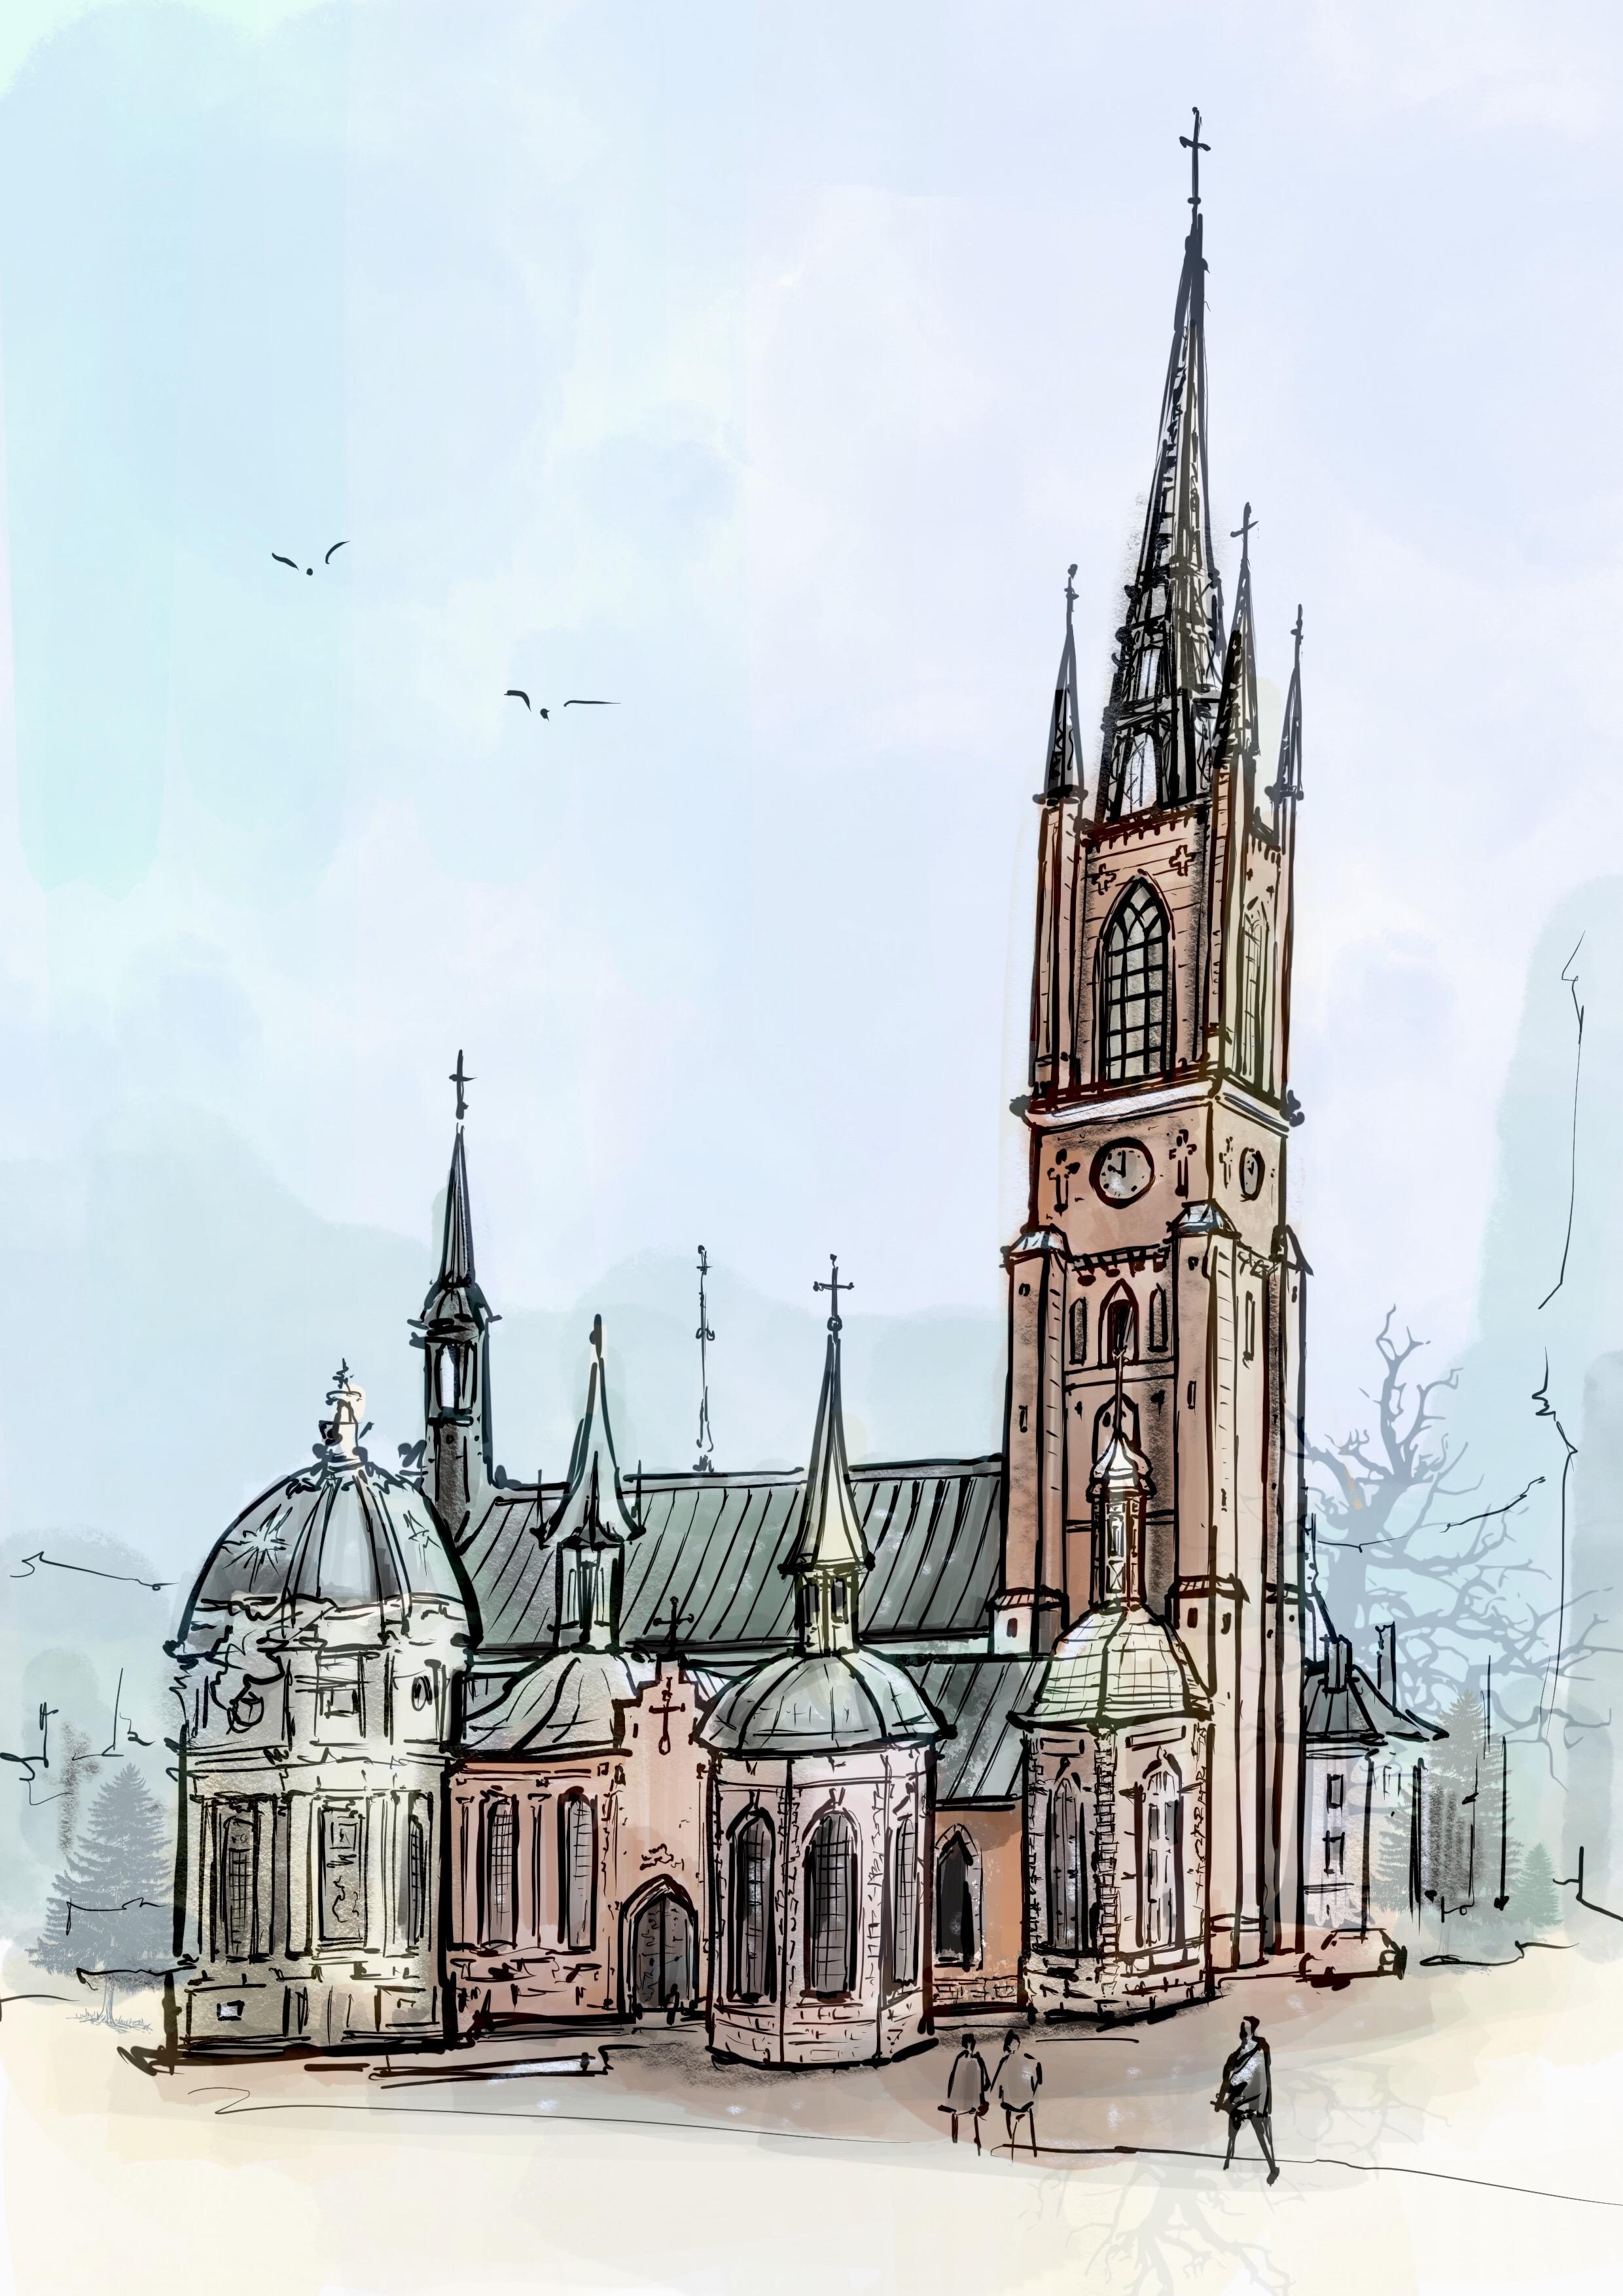 Riddarholmskyrkan 瑞典騎士教堂